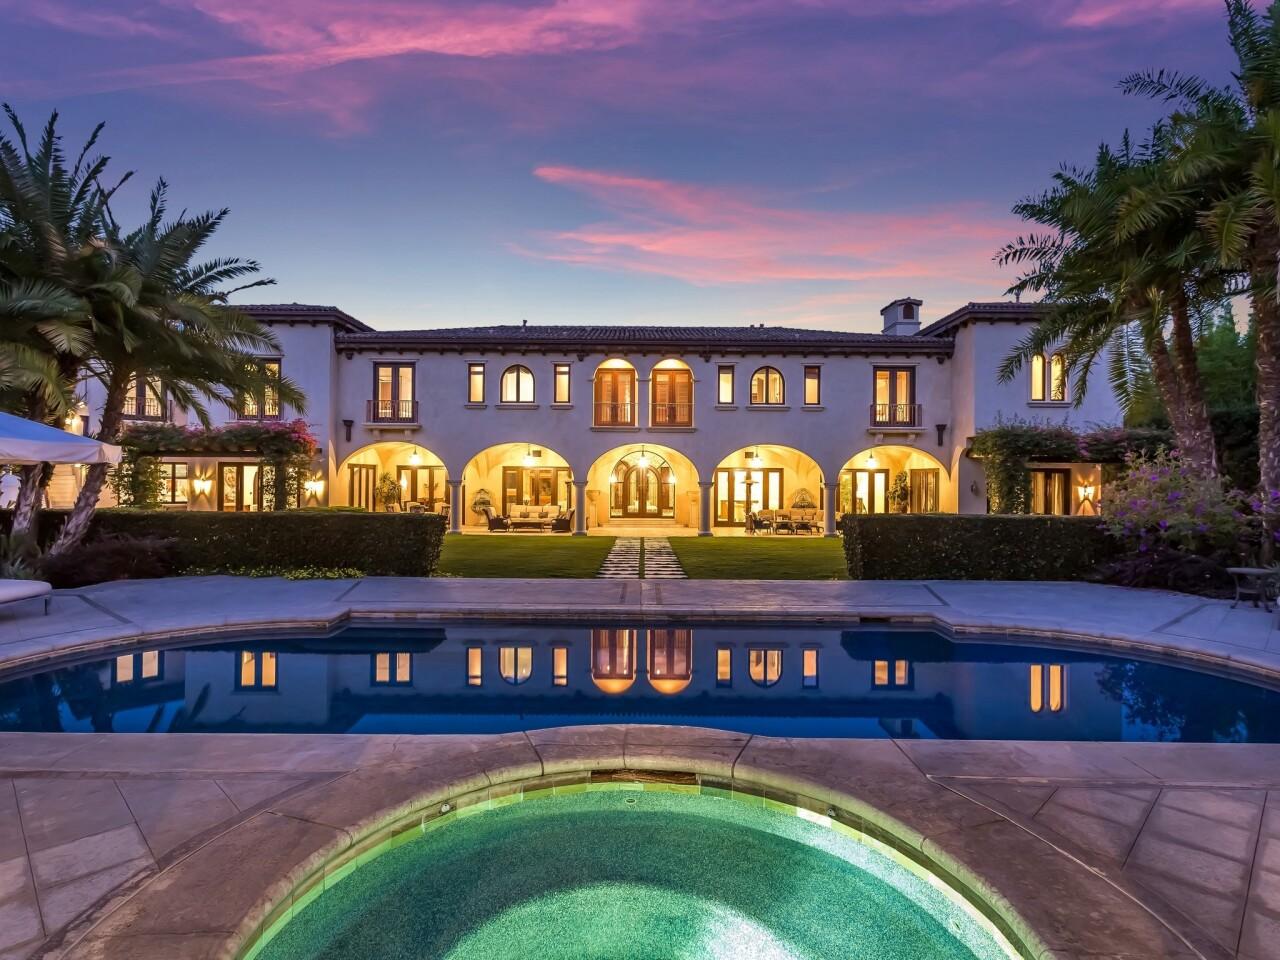 Barry Bonds' former home | Hot Property